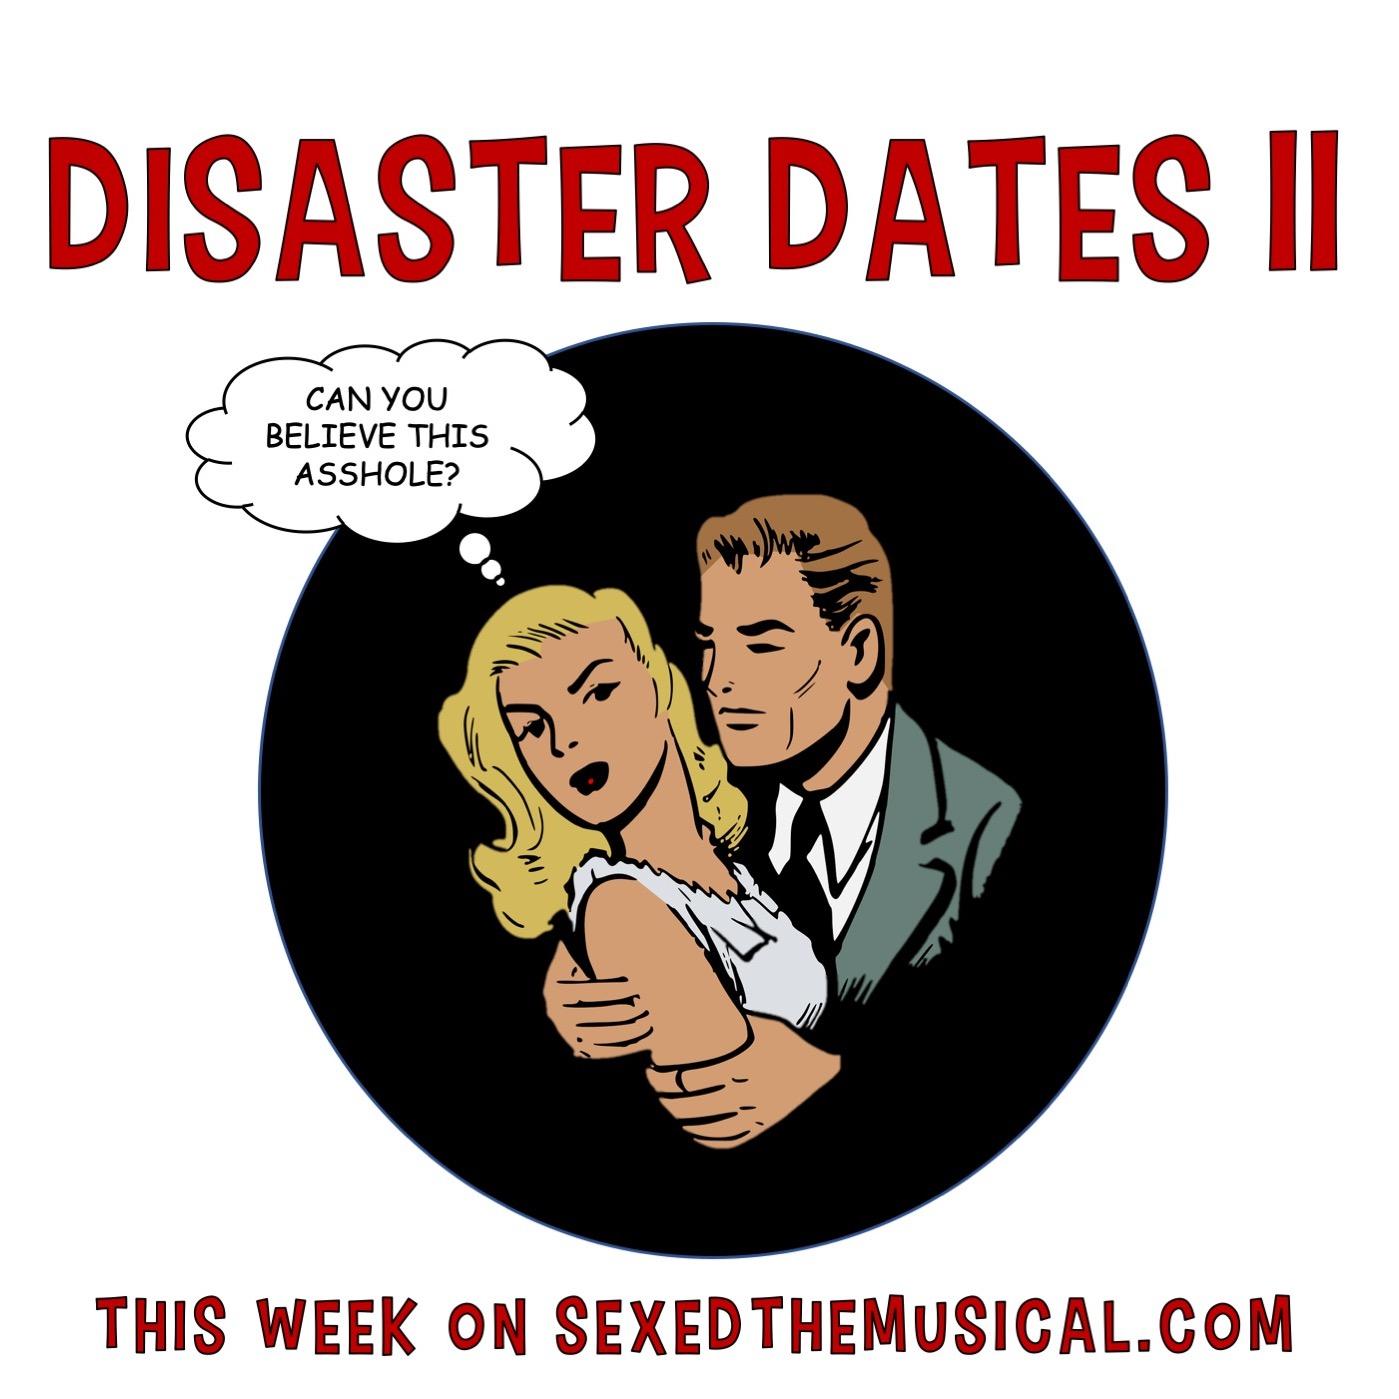 DISASTER DATES 2